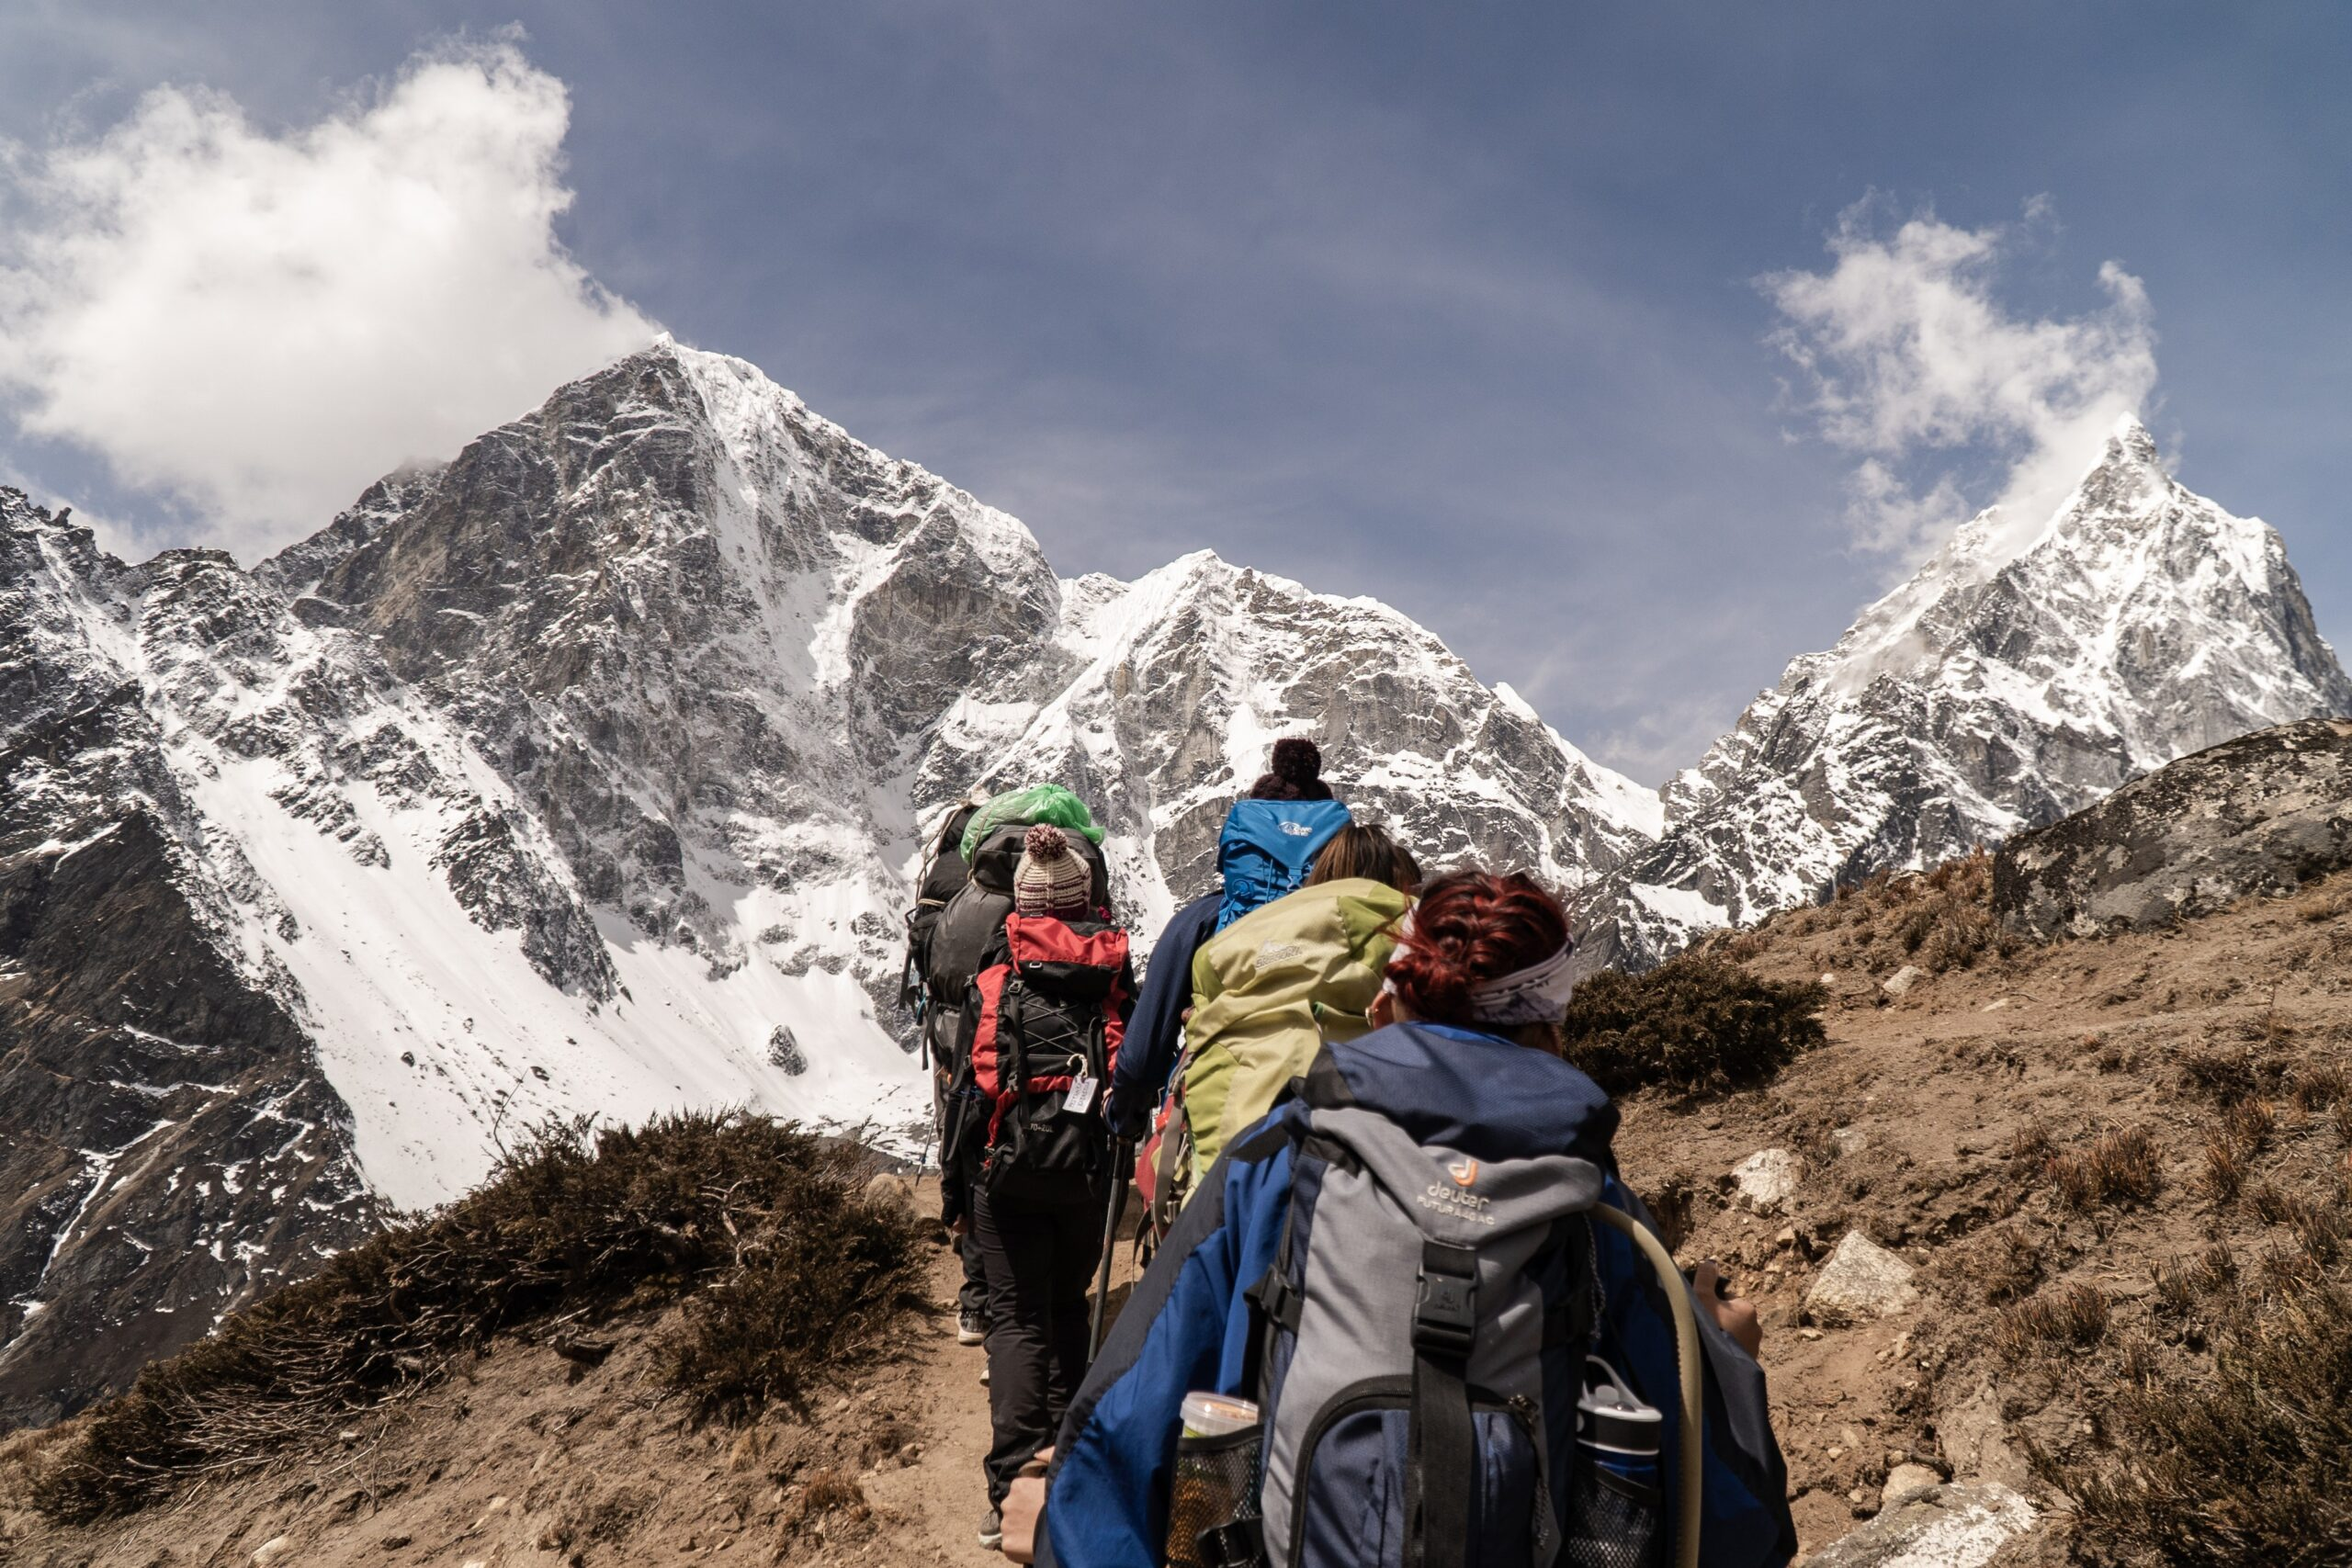 weekend trekking trips